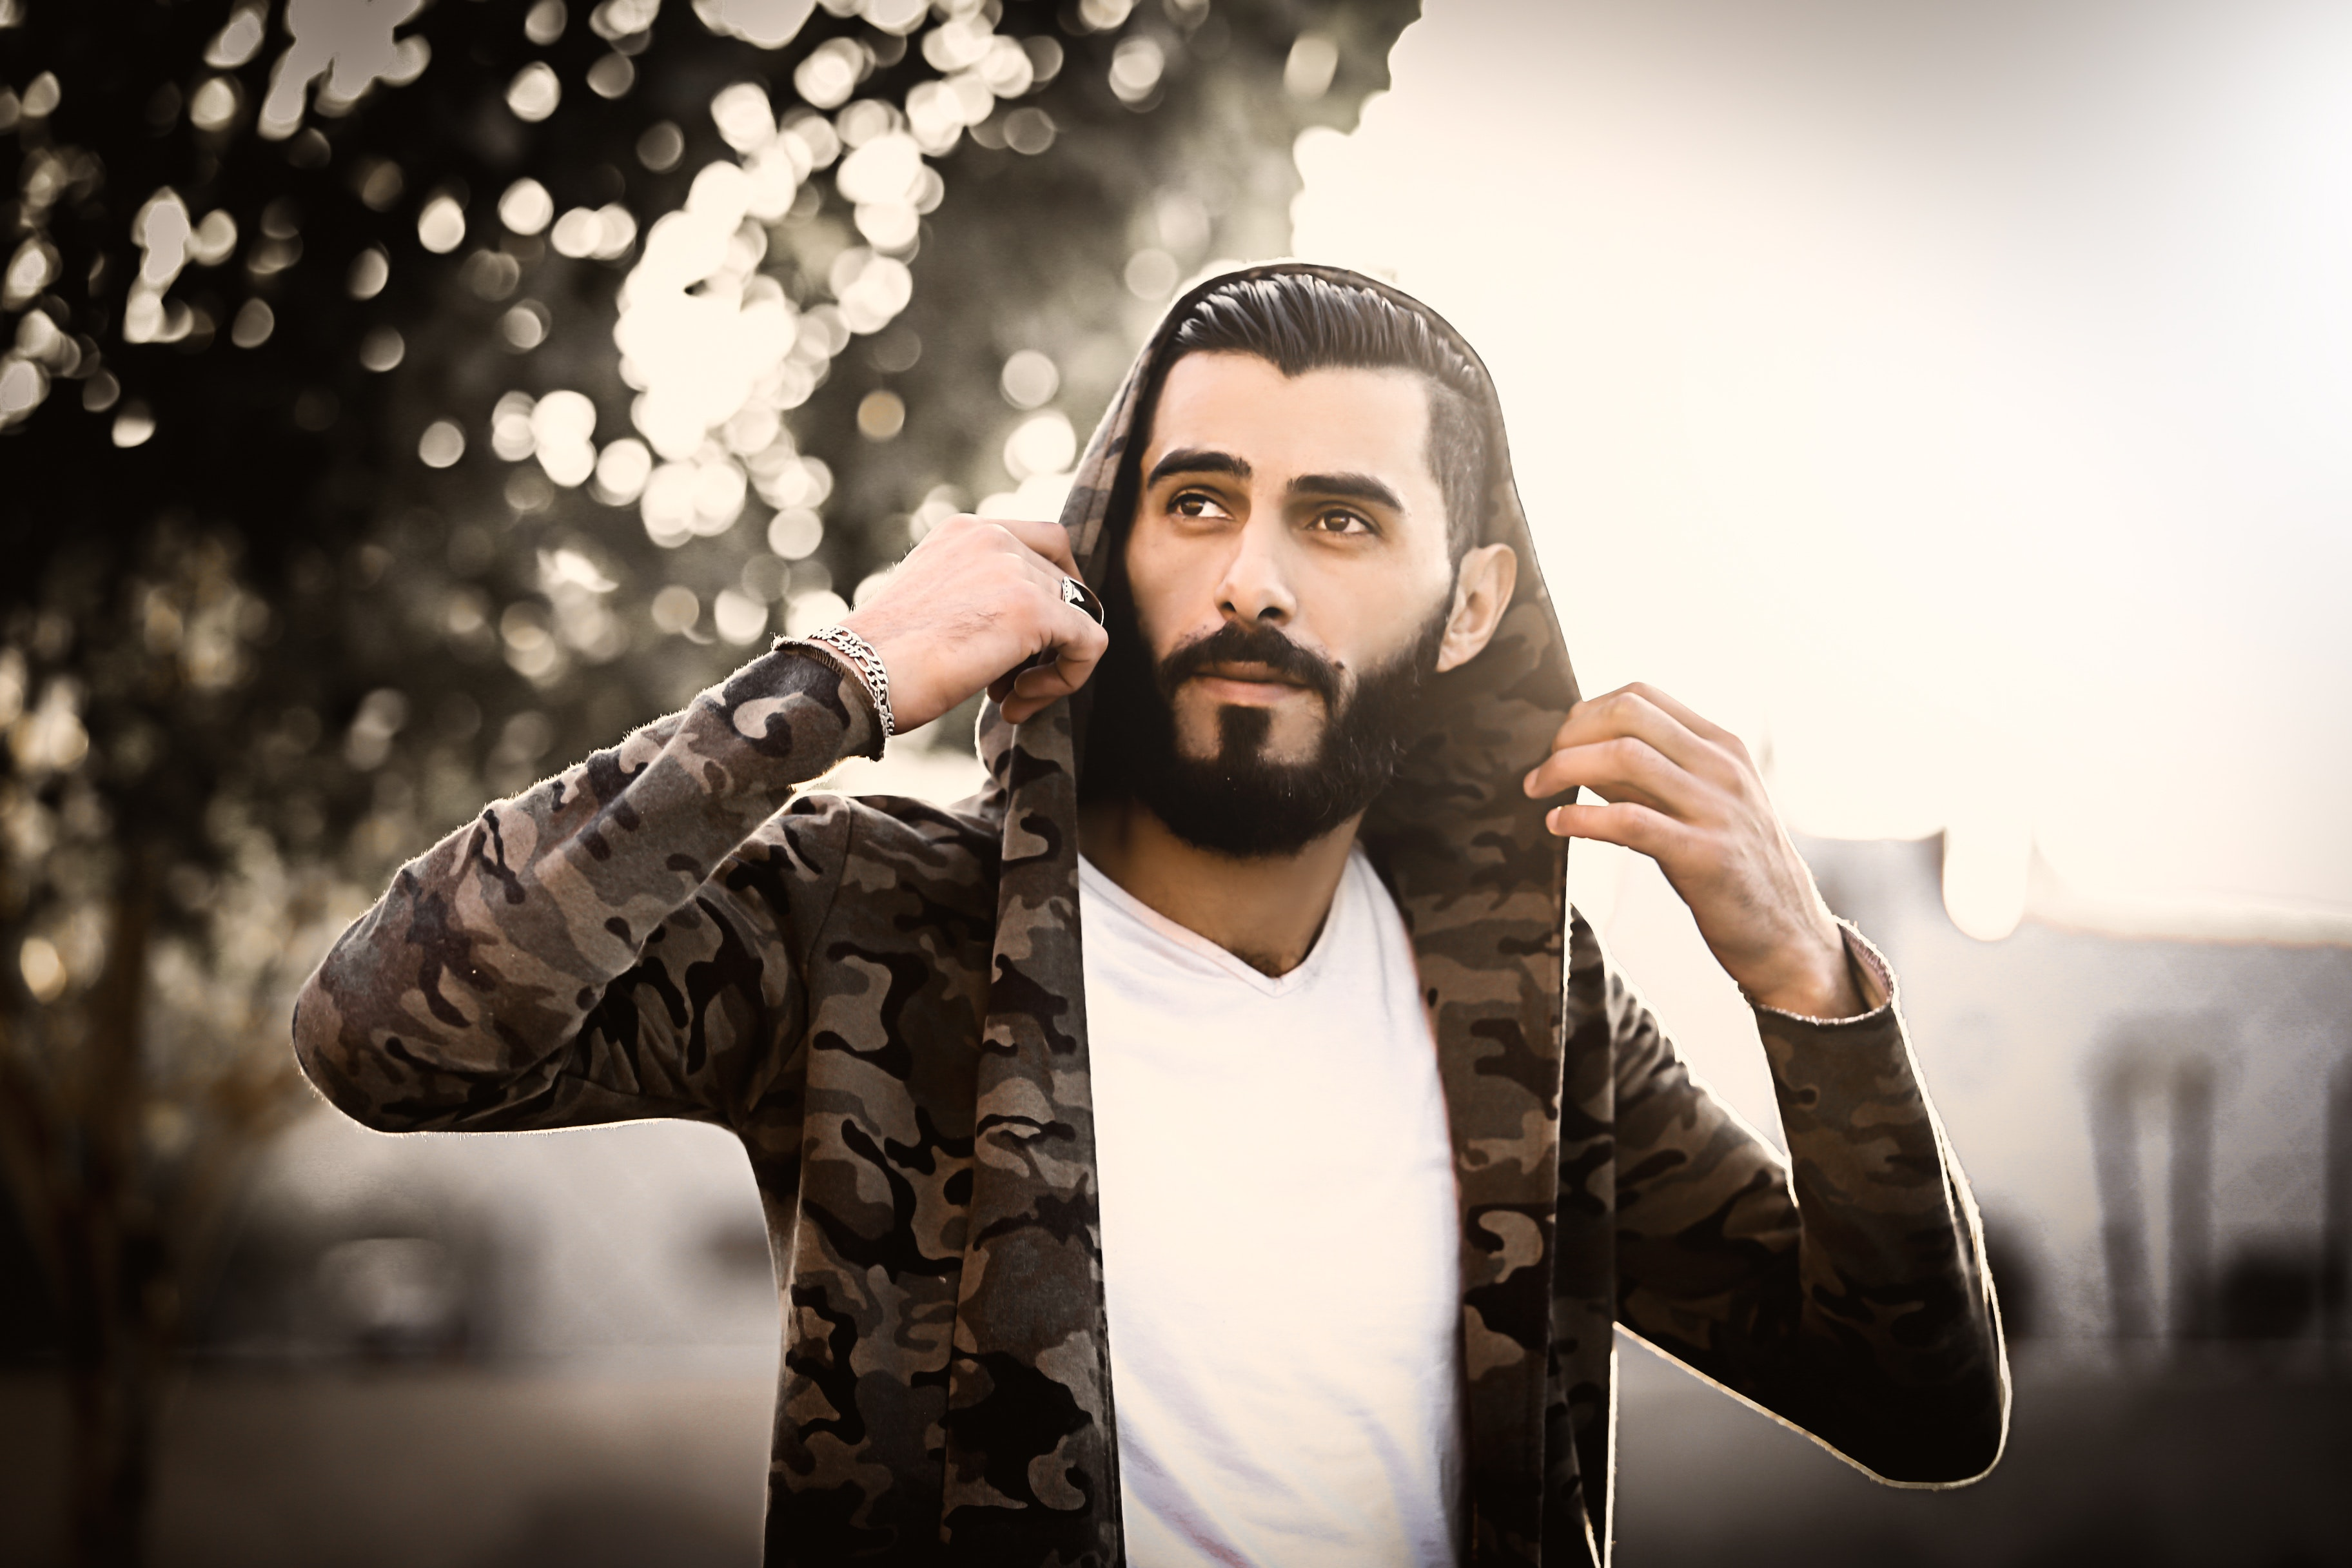 Man Wearing Camouflage Hoodie and White Shirt, Adult, Man, Urban, Tree, HQ Photo